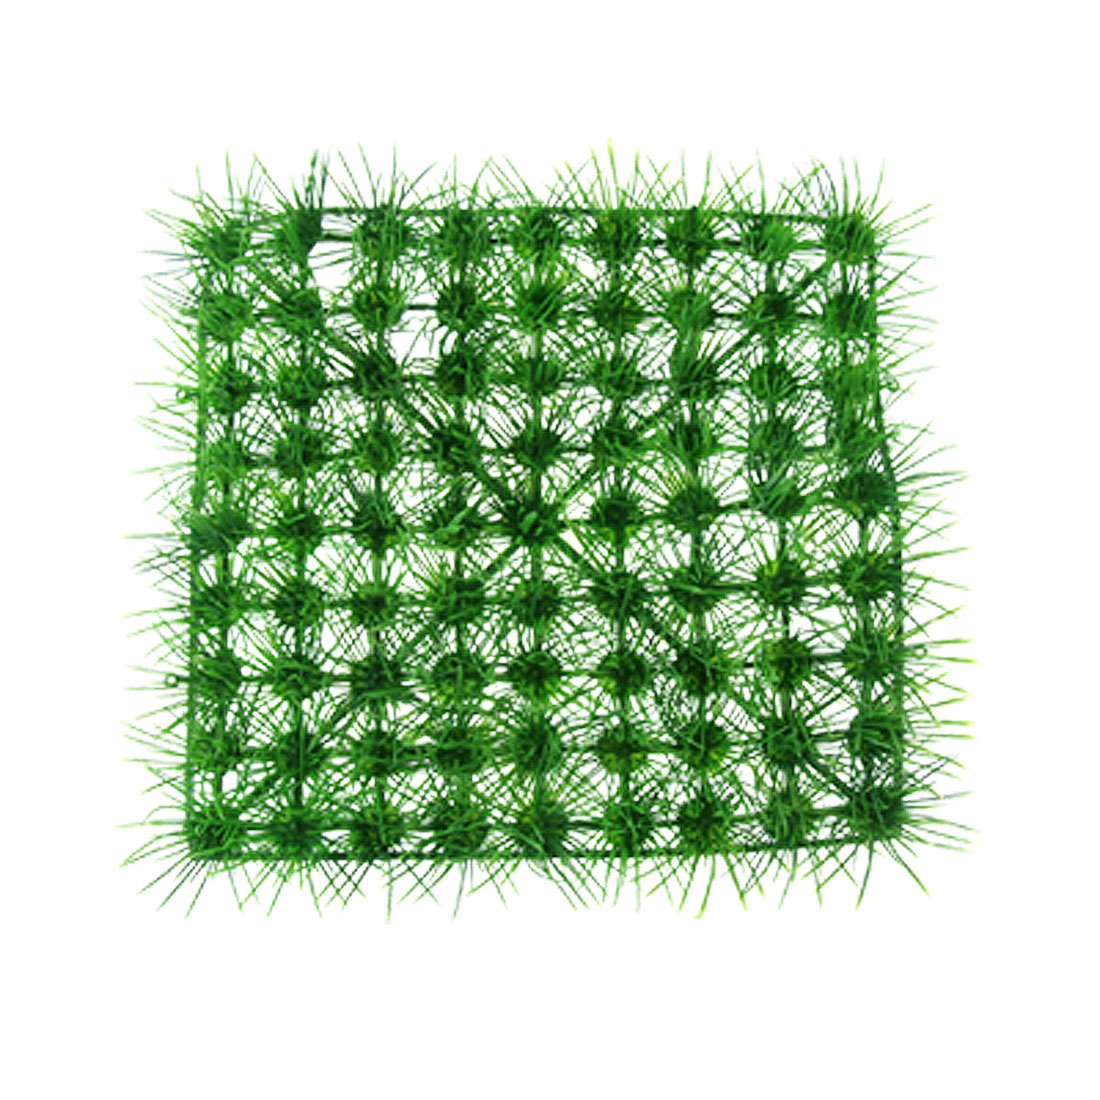 Green Grass Pine Needle Artificial Lawn Room Fish Tank Aquarium Decor